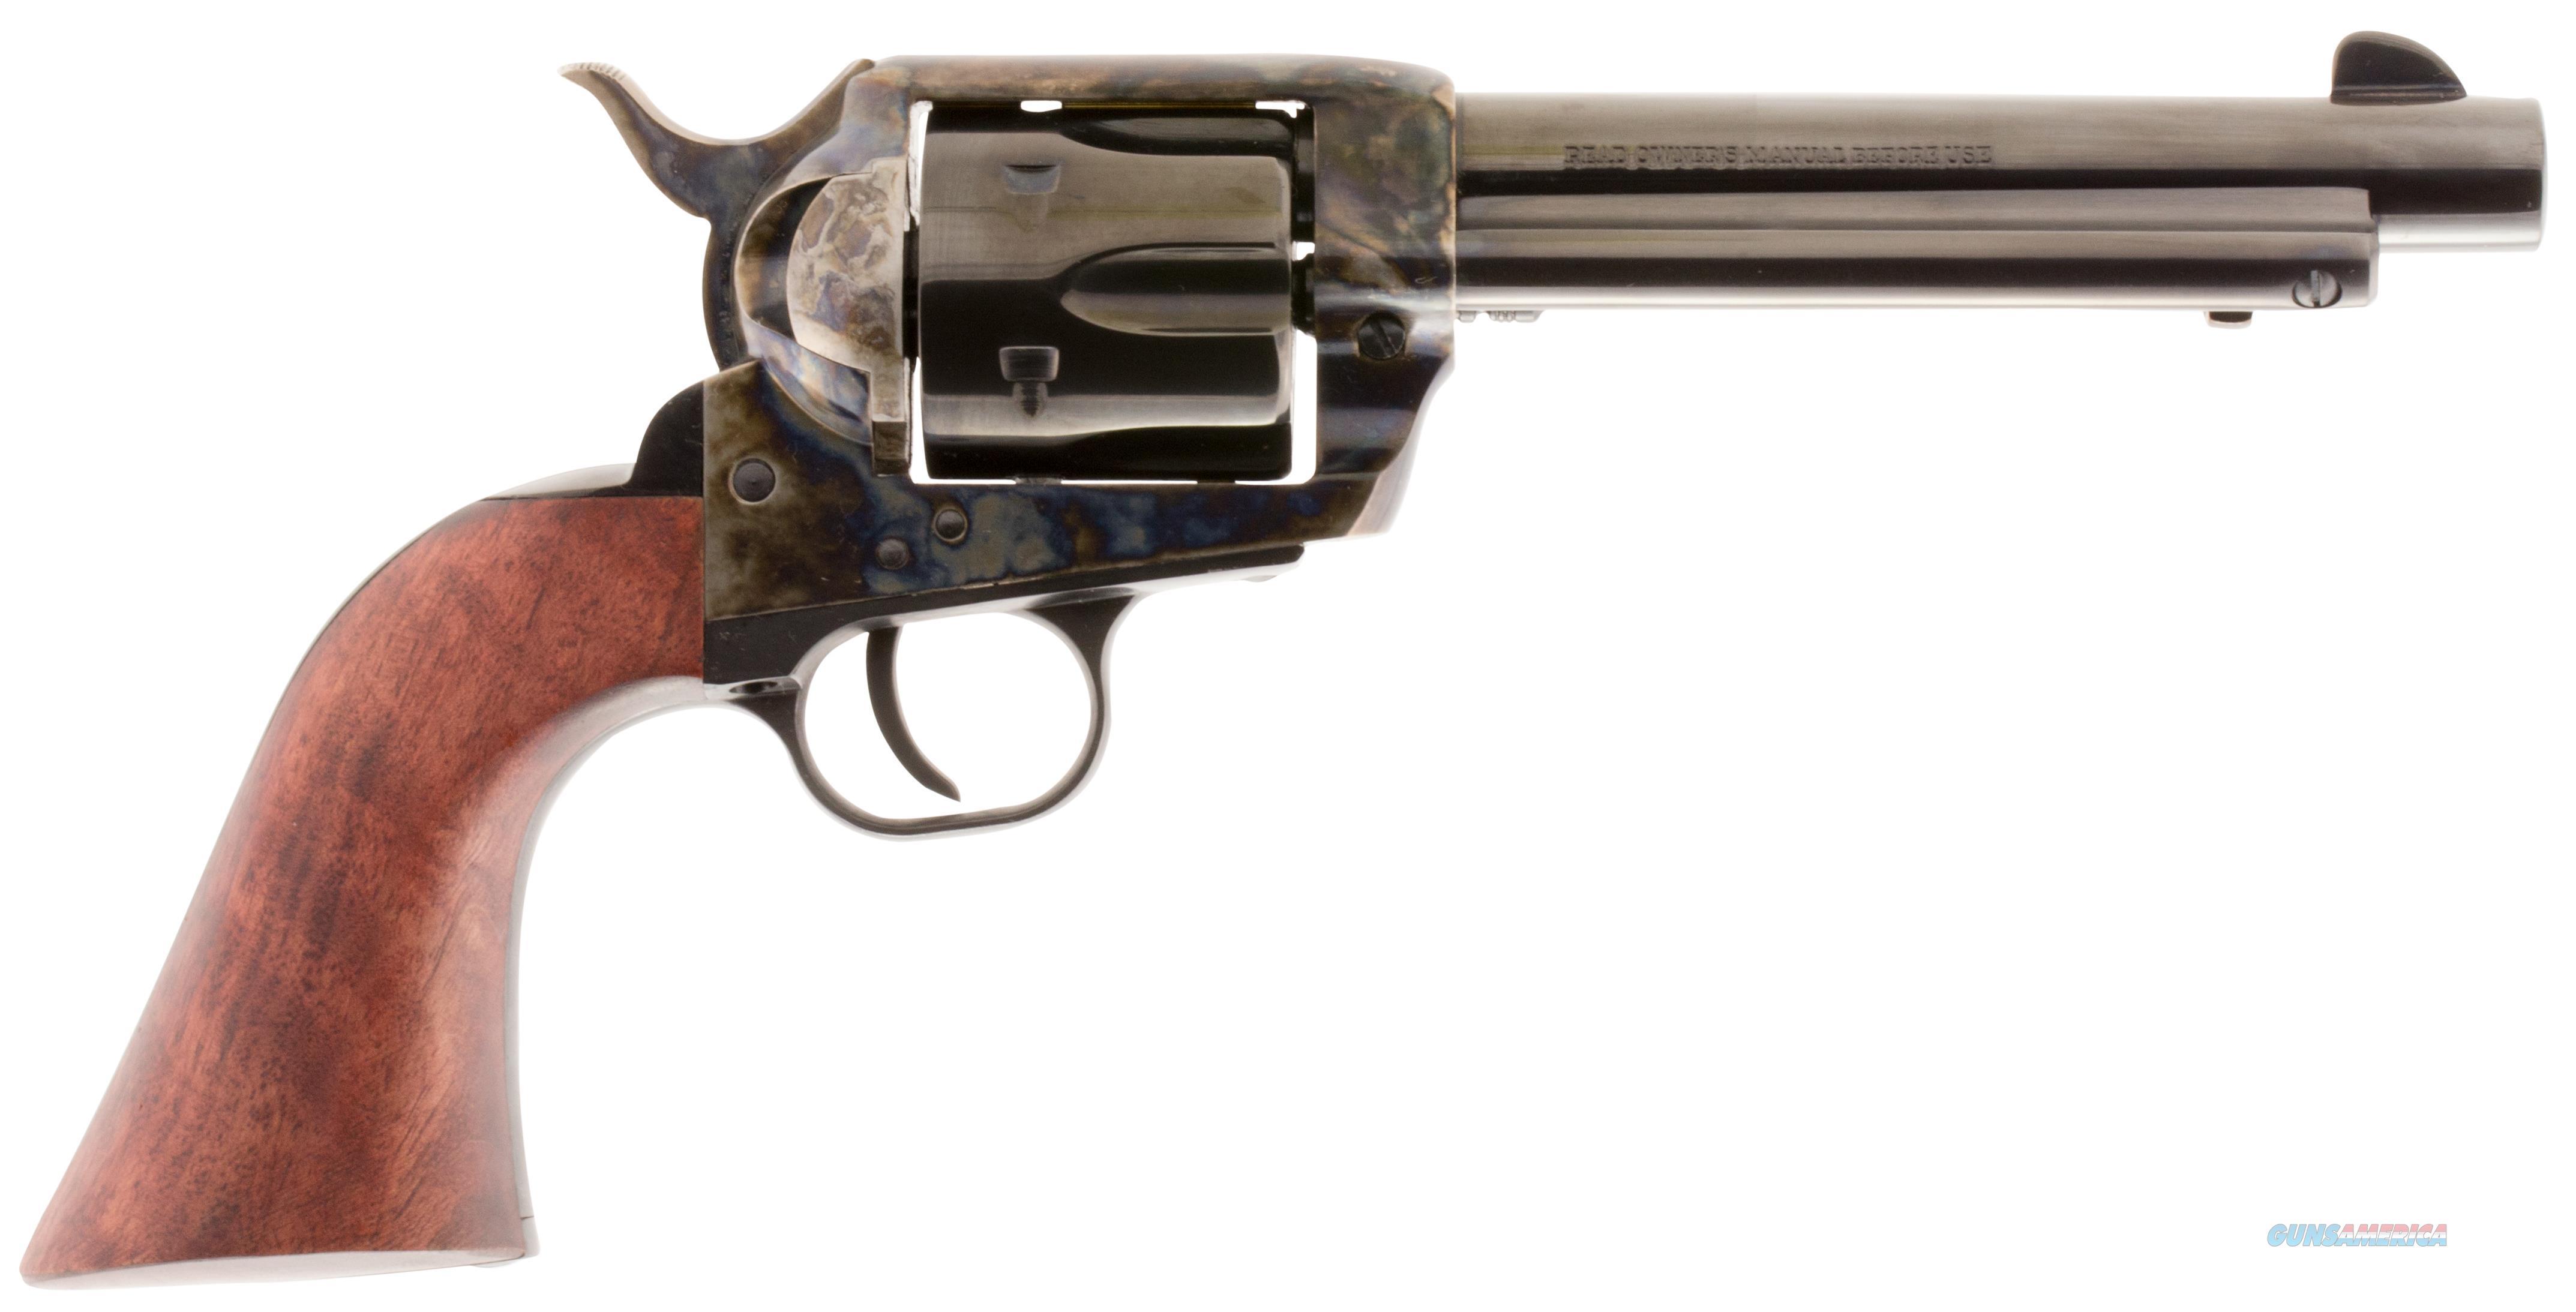 "Traditions Sat73048 1873 Froniter Single 357 Magnum 5.5"" 6 Walnut Blued SAT73048  Guns > Pistols > Traditions Pistols"